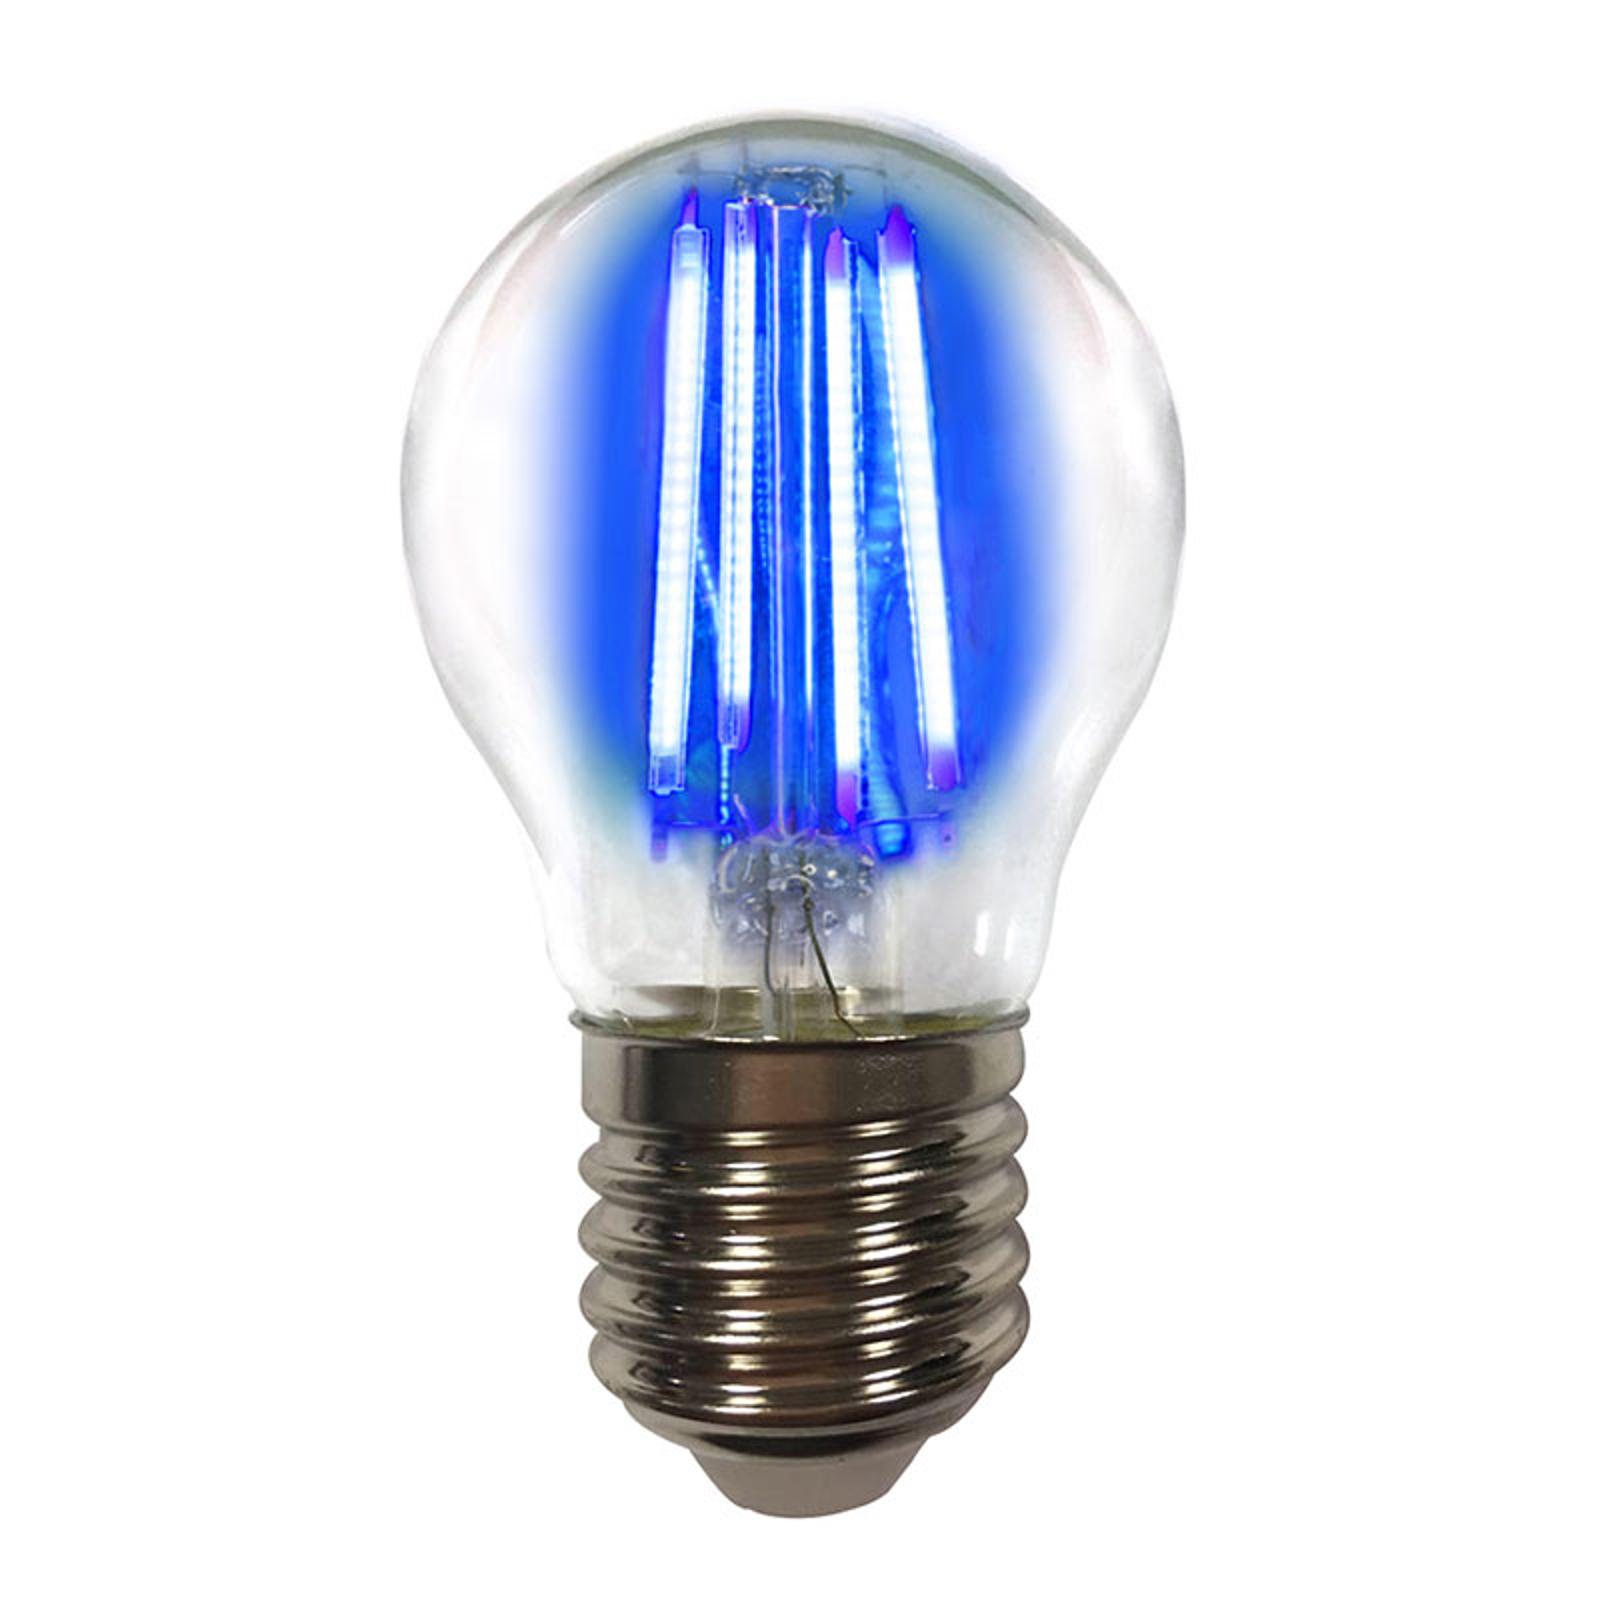 Farbig leuchtend E27 4W LED-Lampe Filament kaufen